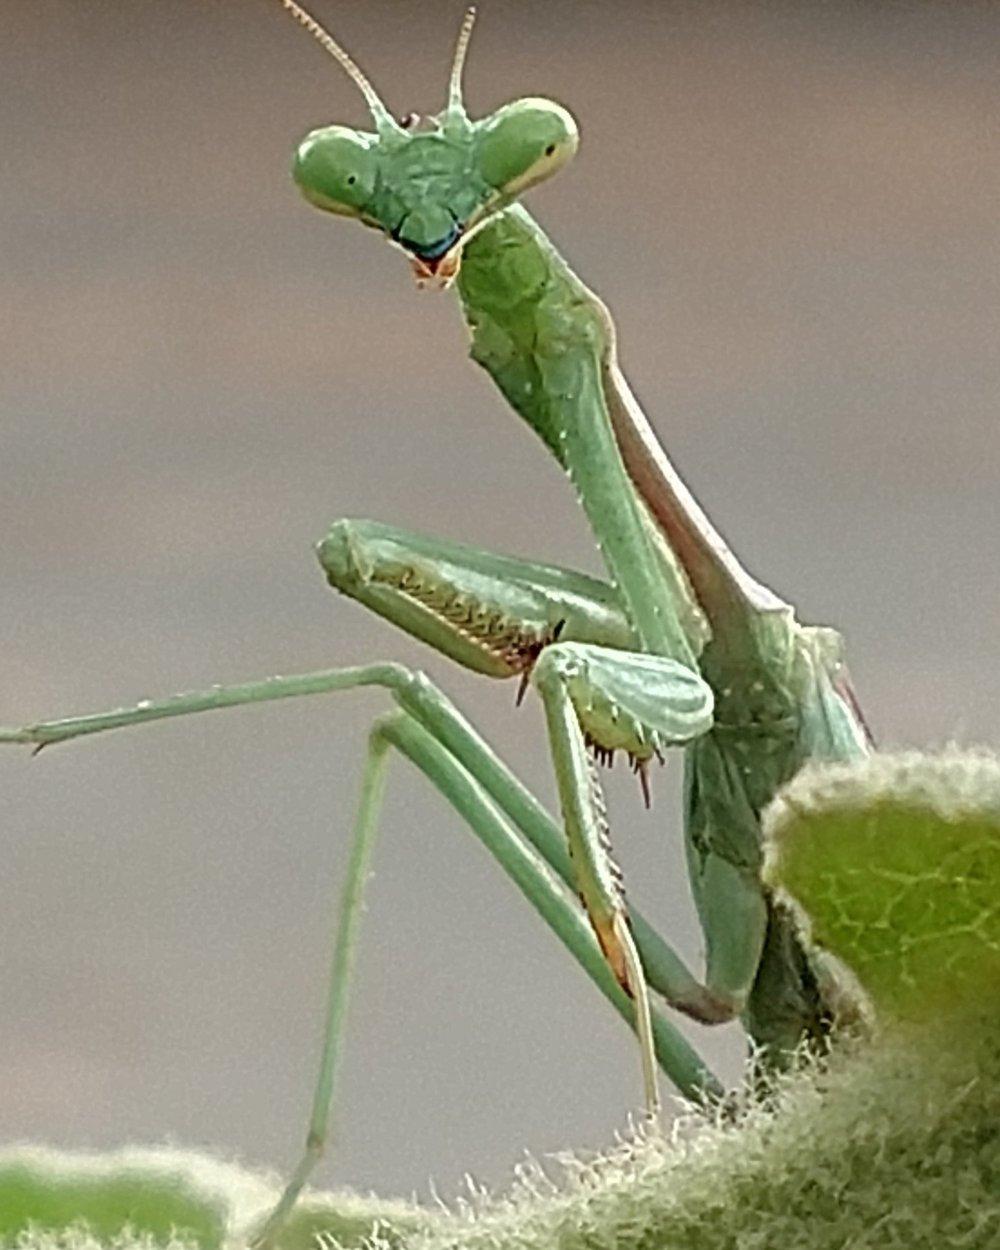 Common vineyard beneficial insect, preying mantid. Monserate Vineyard, Fallbrook, CA